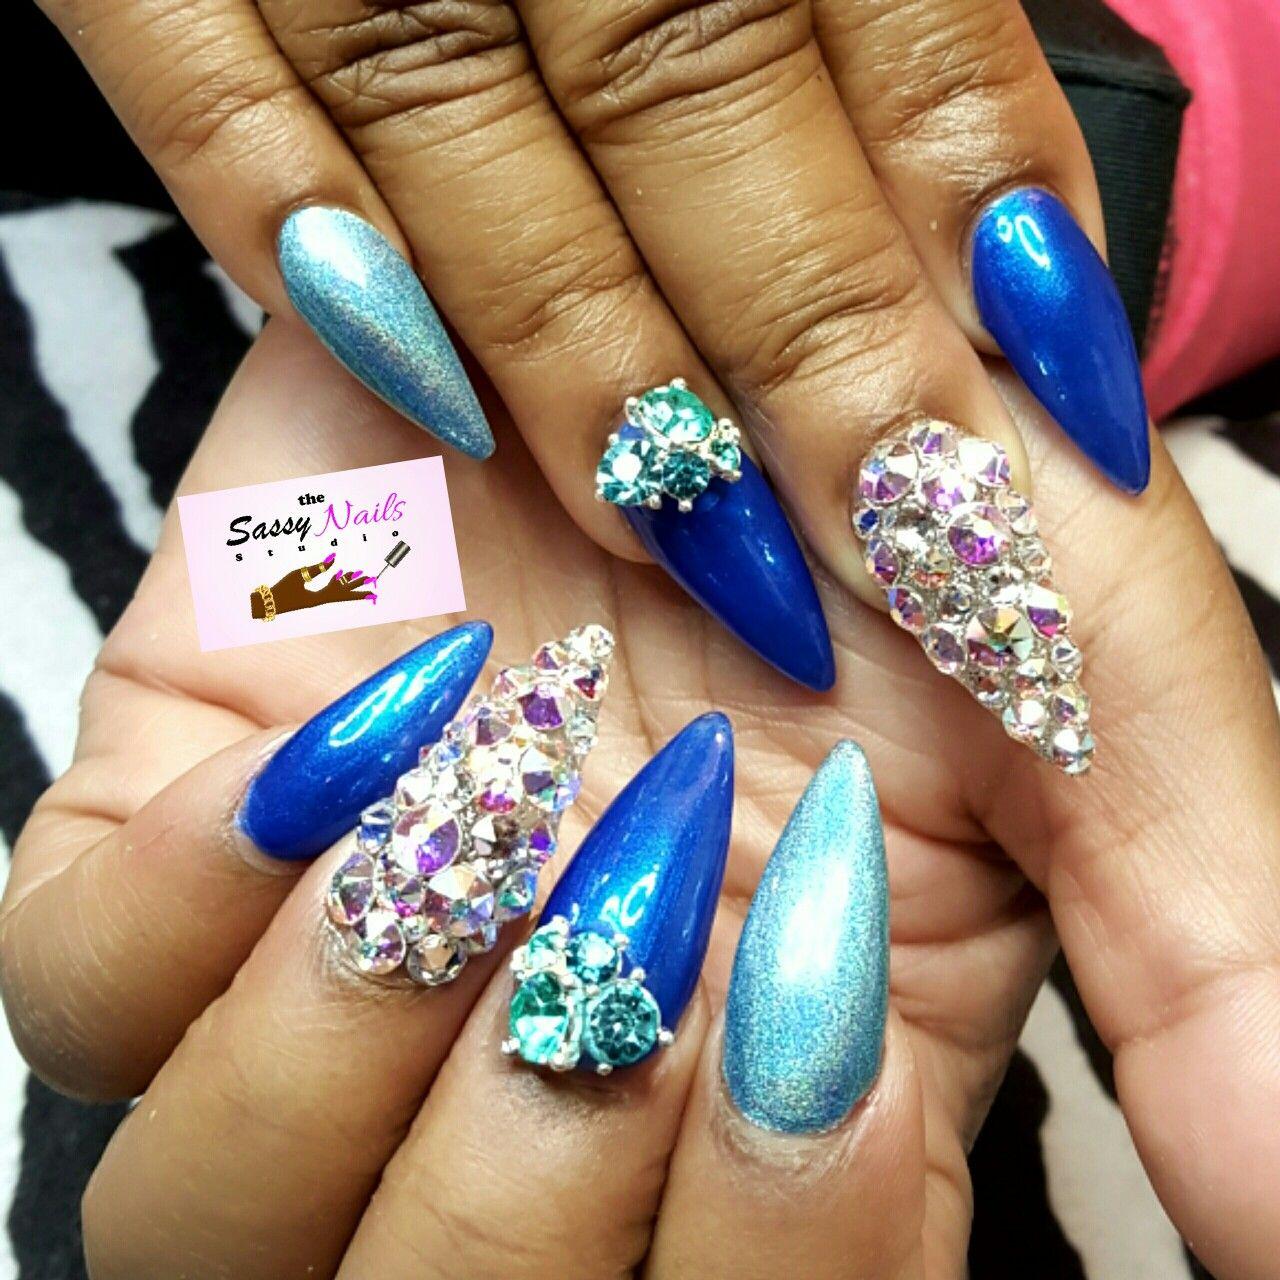 Pin by The Sassy Nails Studio on Sassy Nails | Pinterest | Fabulous ...